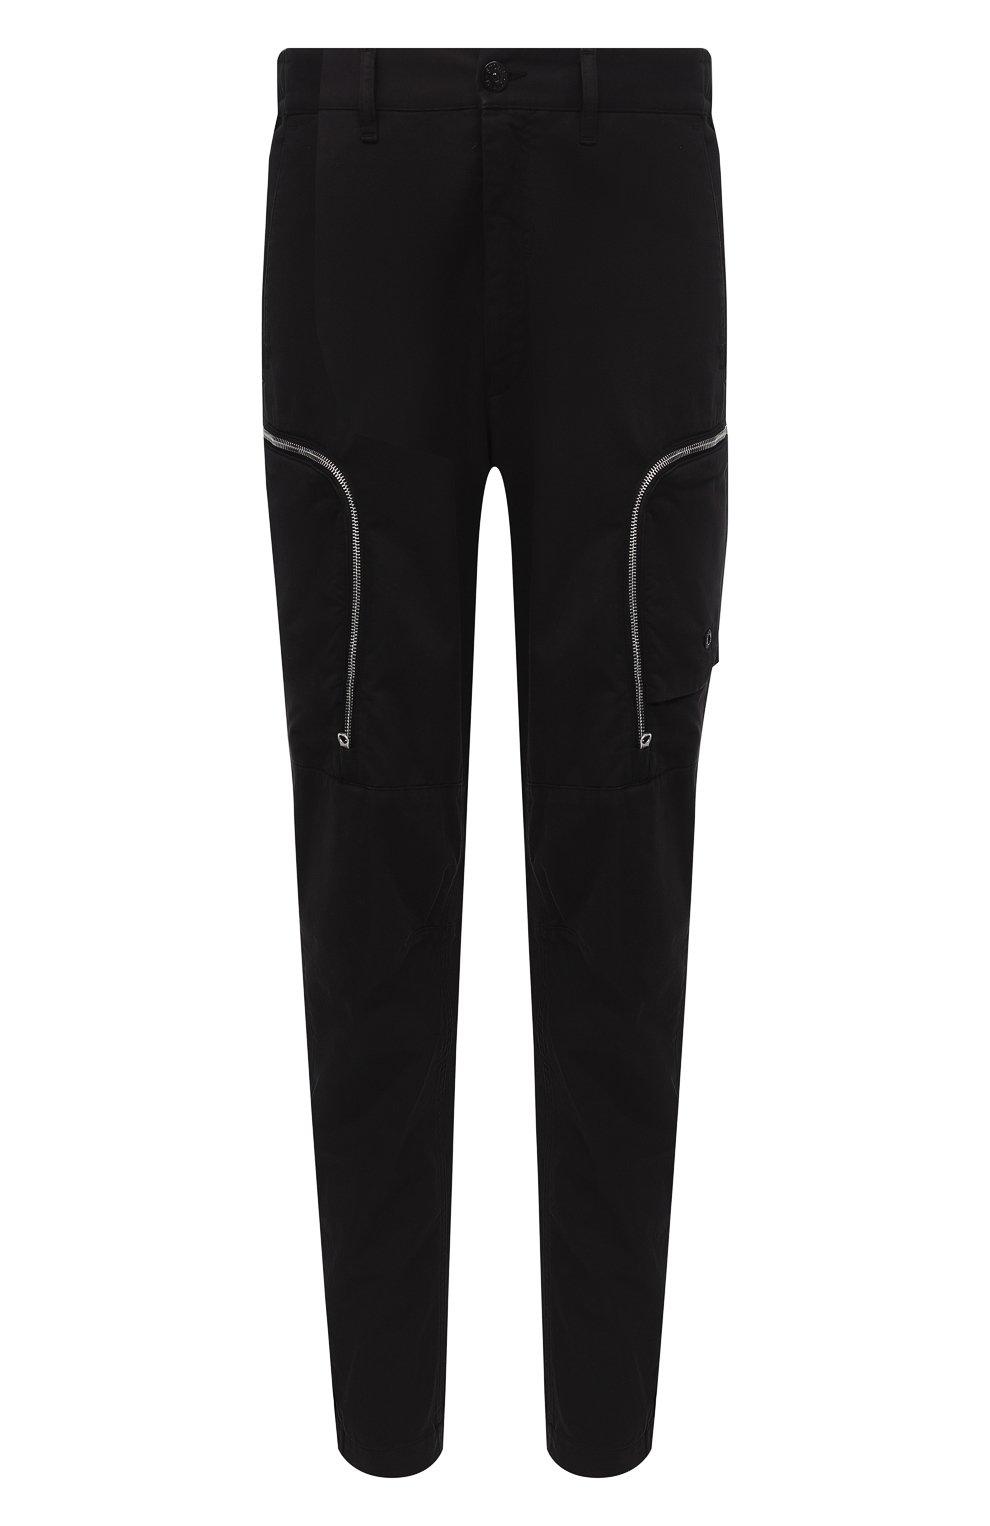 Мужские брюки-карго из хлопка и шерсти STONE ISLAND SHADOW PROJECT черного цвета, арт. 731930508 | Фото 1